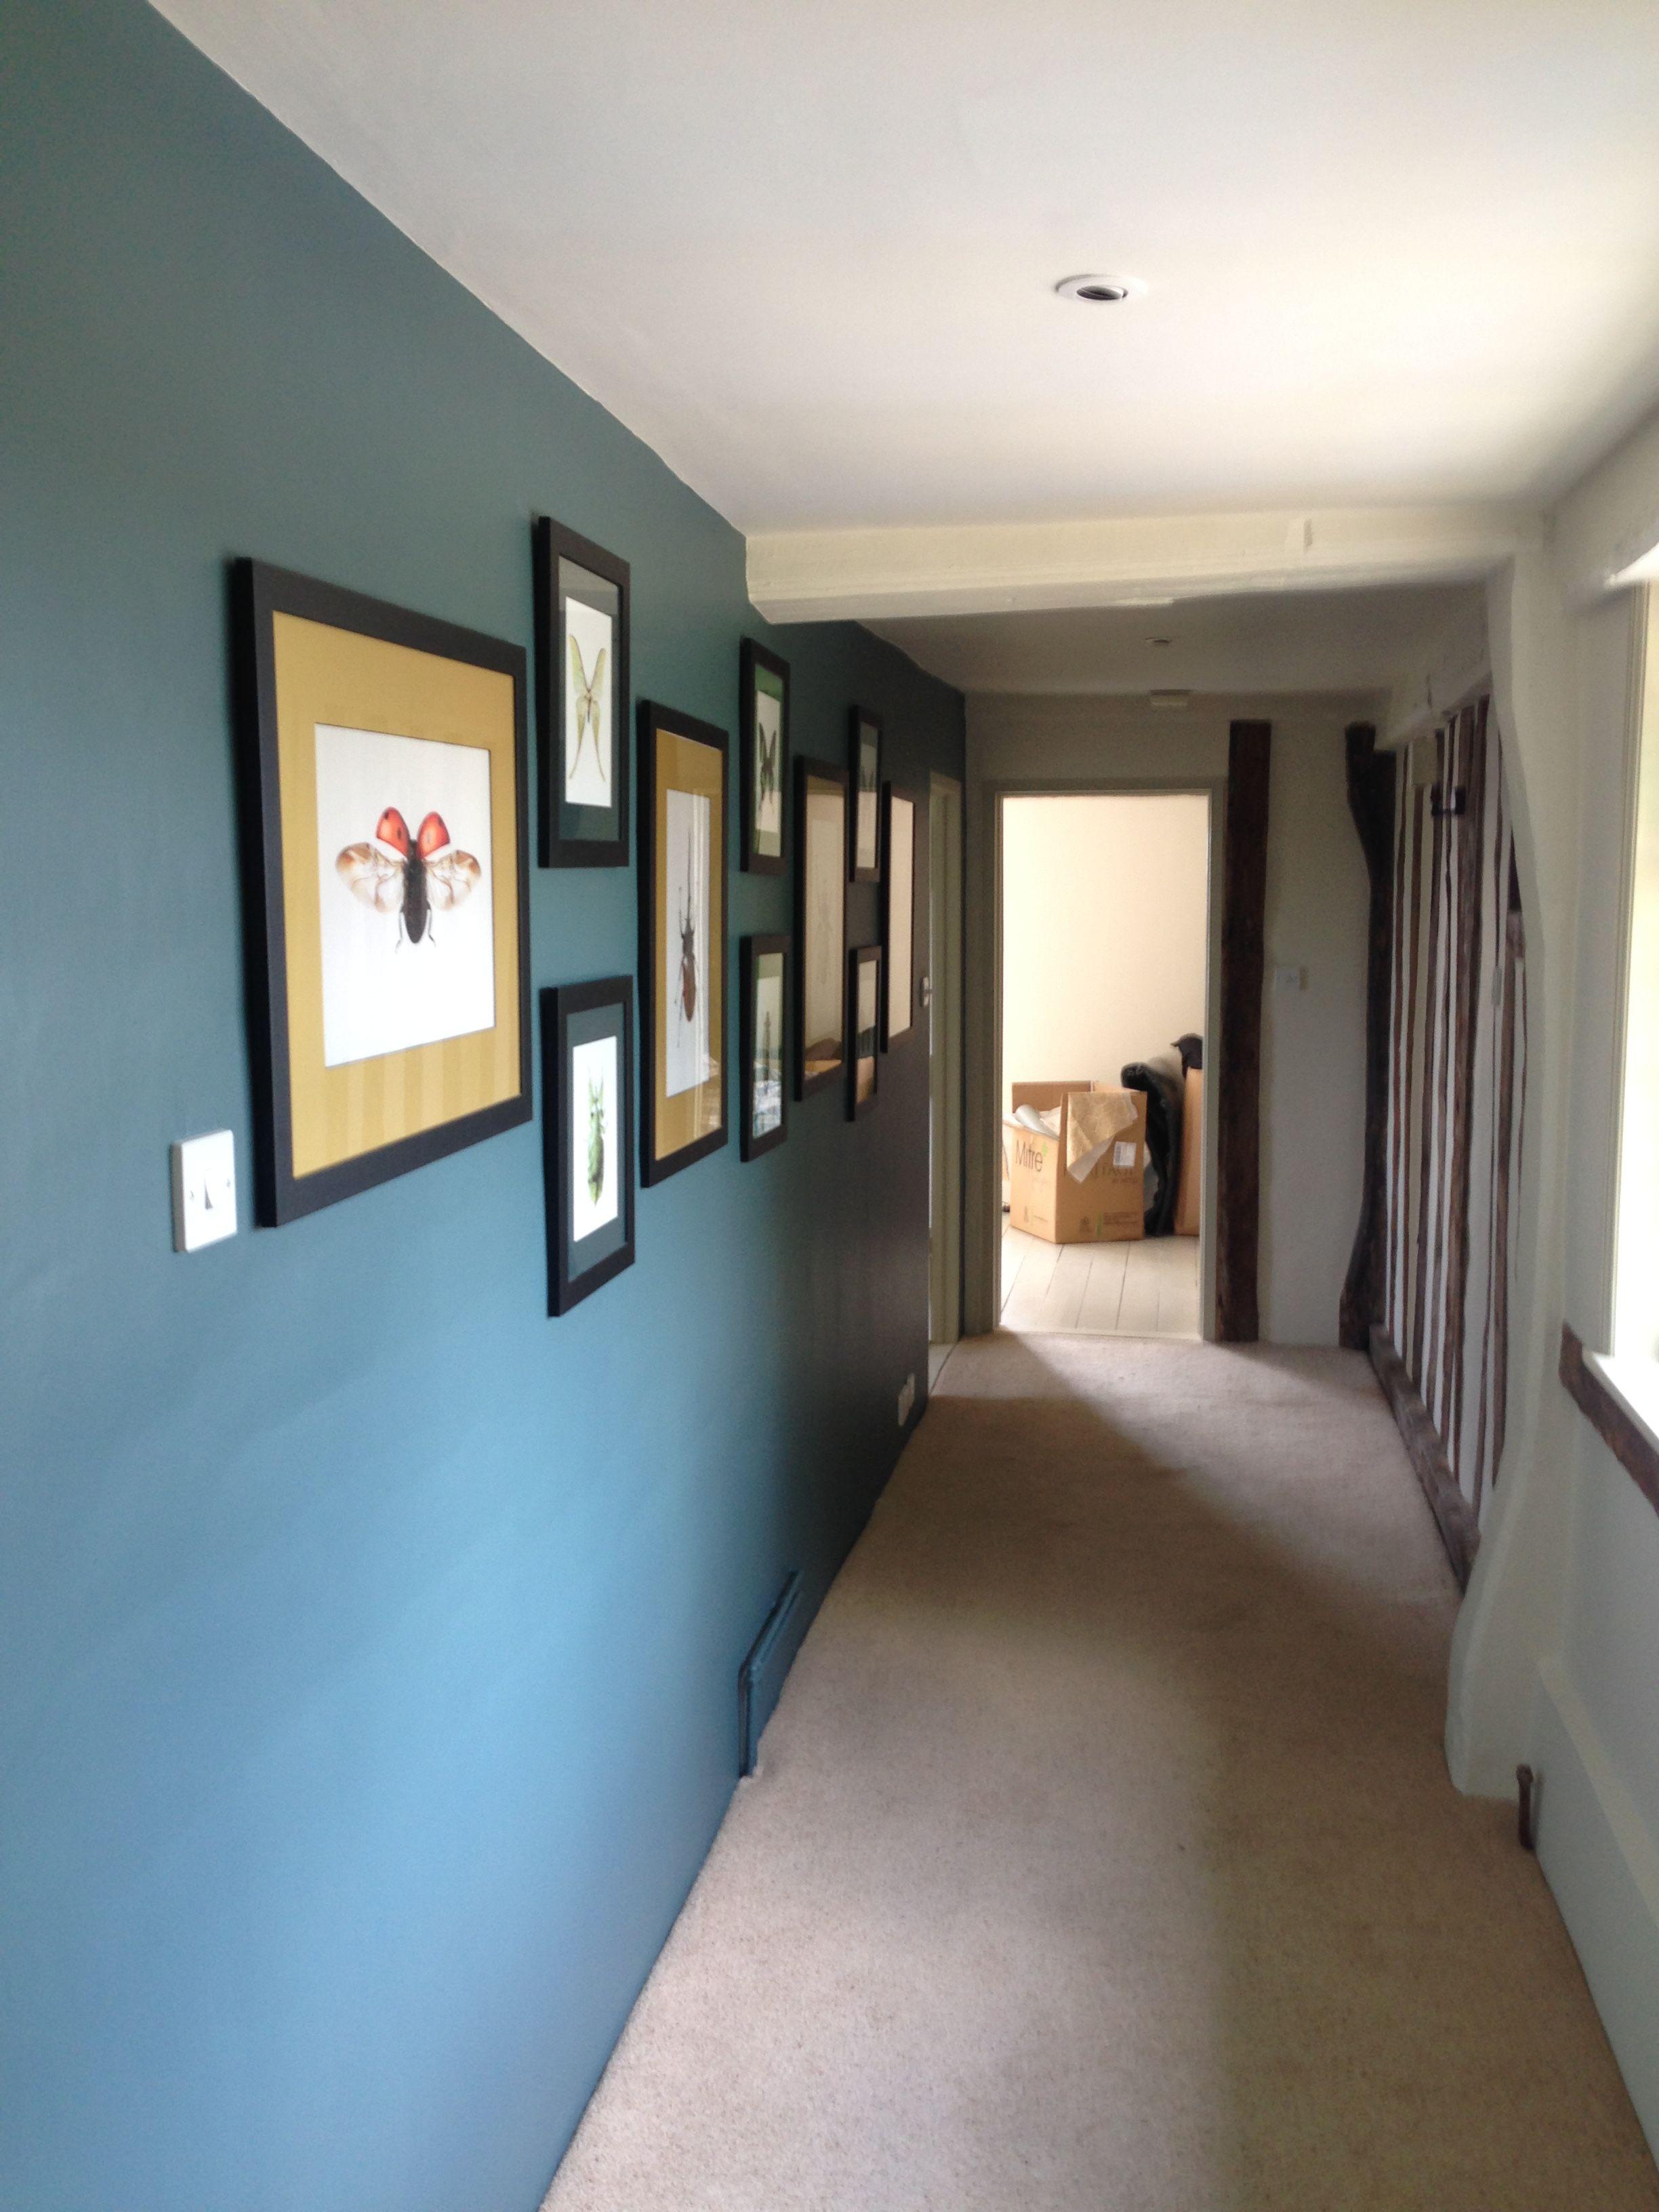 Farrow Amp Ball Inchyra Blue Wall With Bespoke Framed Bug